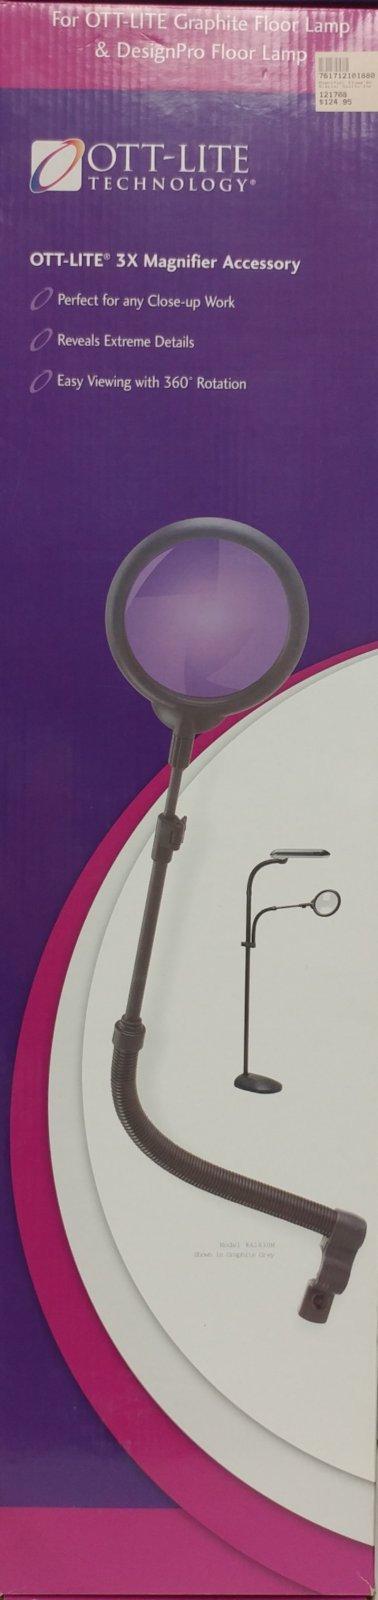 Ott-Lite 3X Magnifyer Clamp On Model A1830 Graphite Grey *